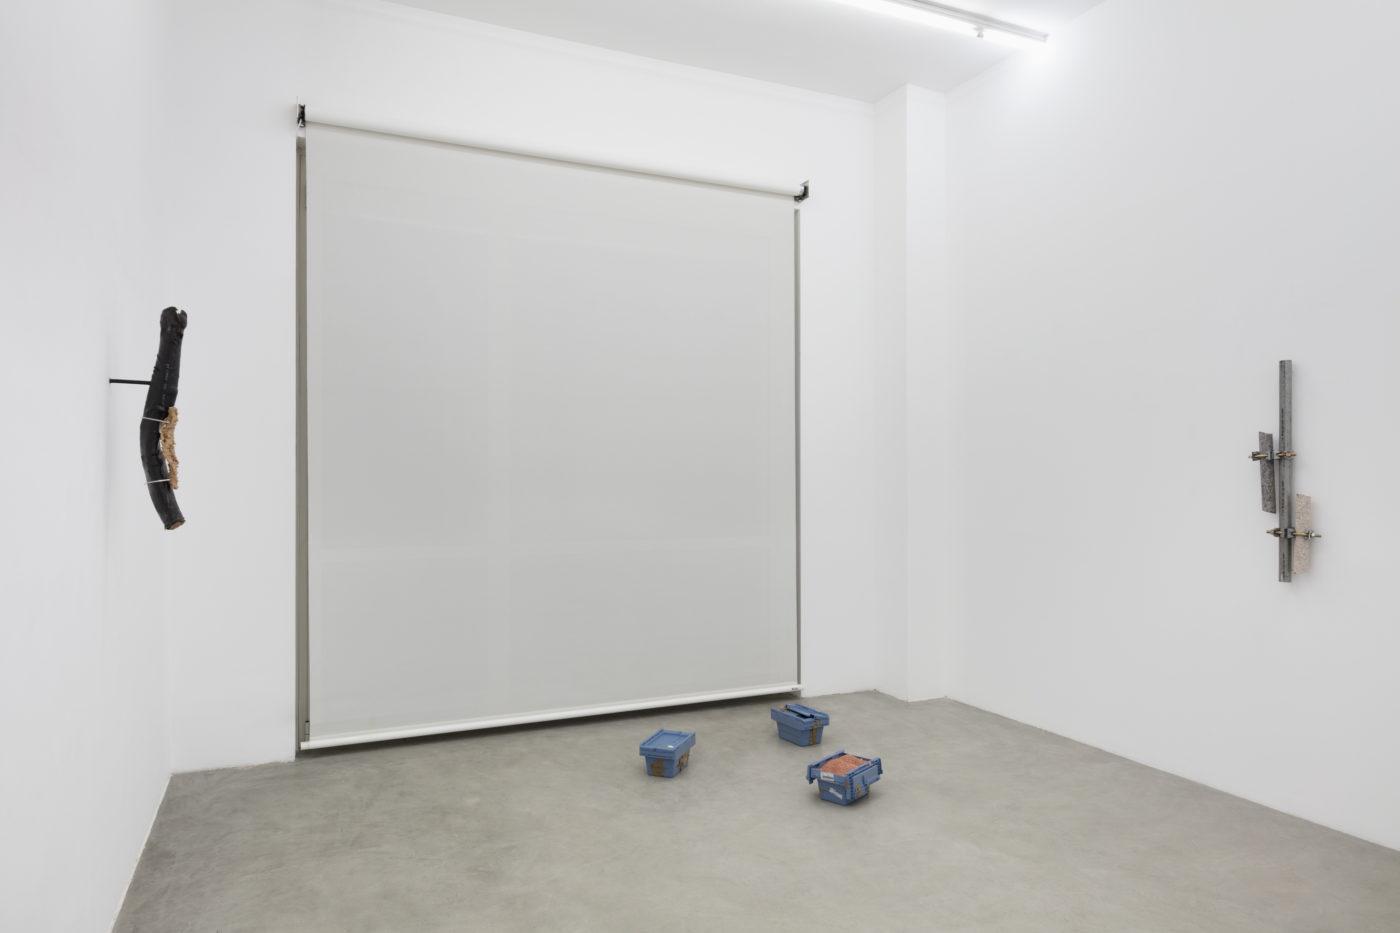 Daniel De Paula. Installation view at Francesca Minini, Milan. ph. Andrea Rossetti